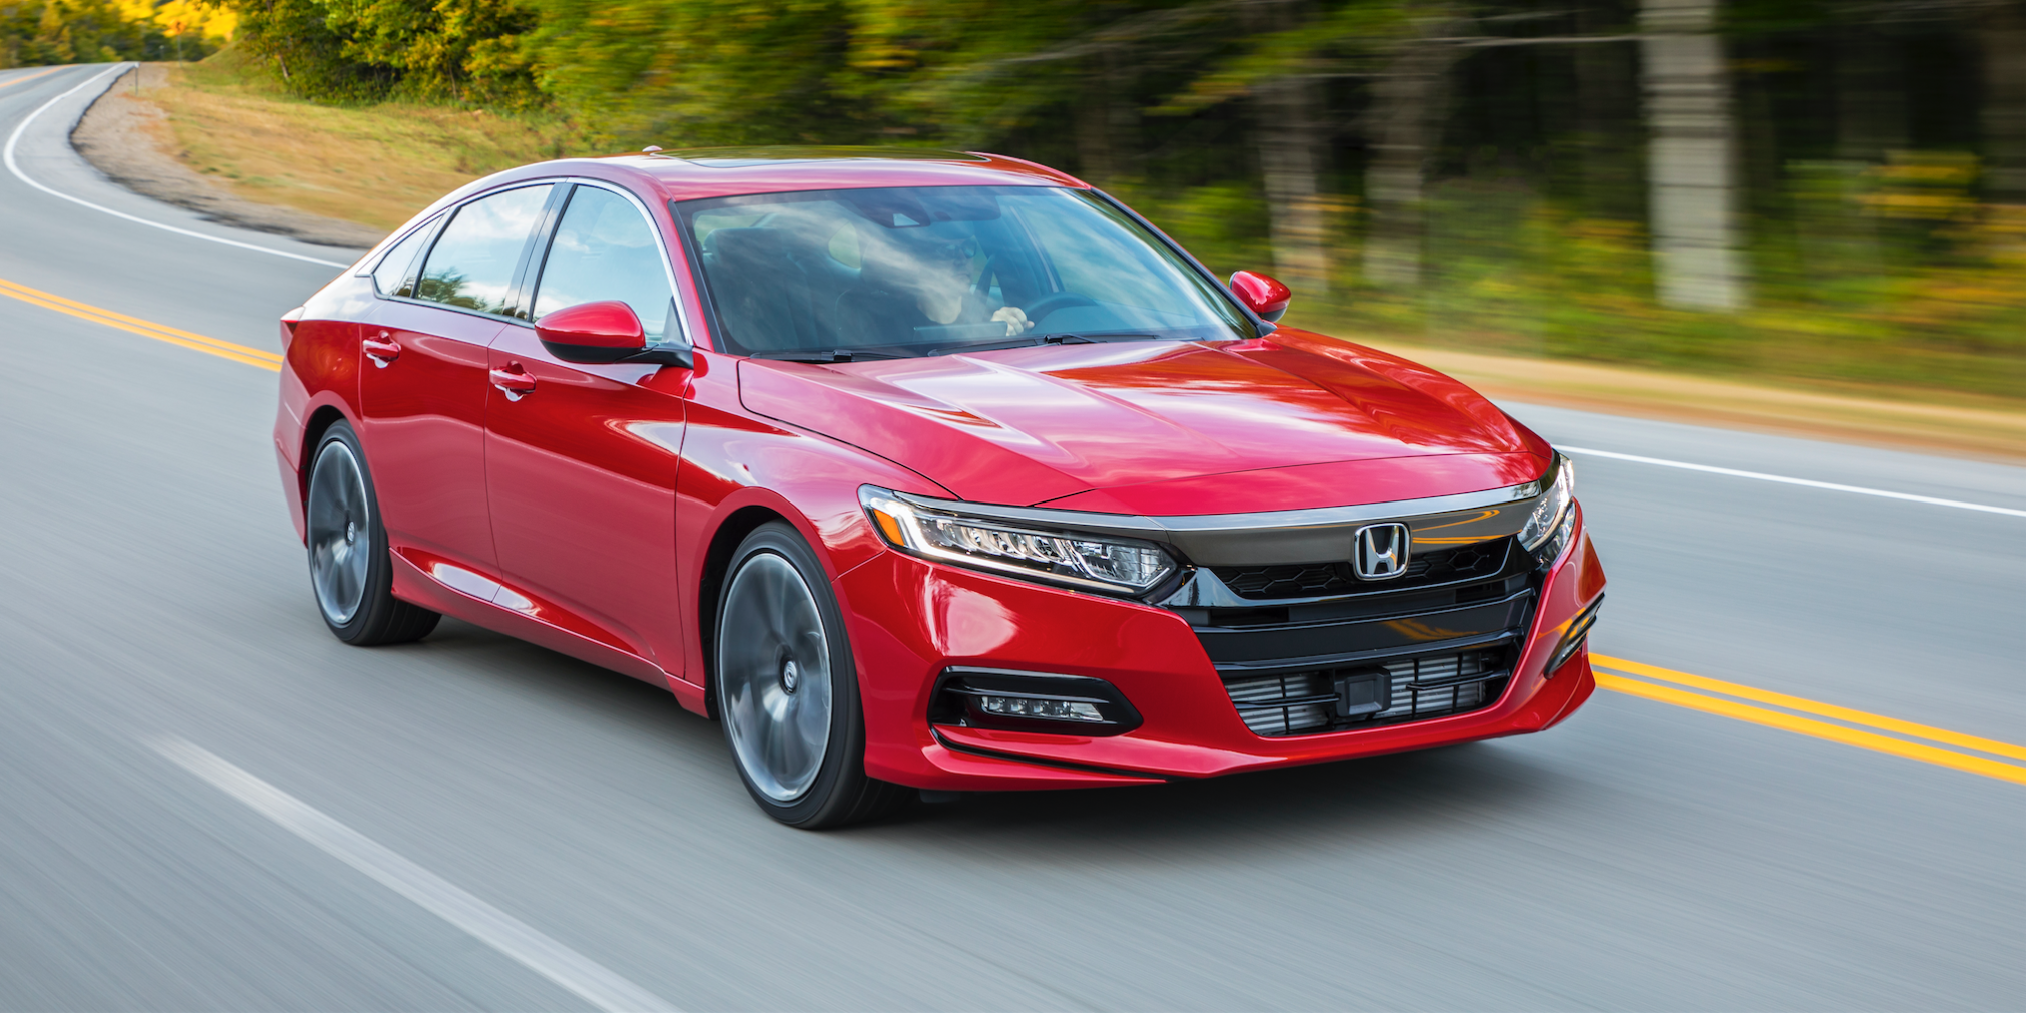 2020 Honda Accord Prices Rise By 185 385 Honda Accord Sport Accord Sport Honda Cars